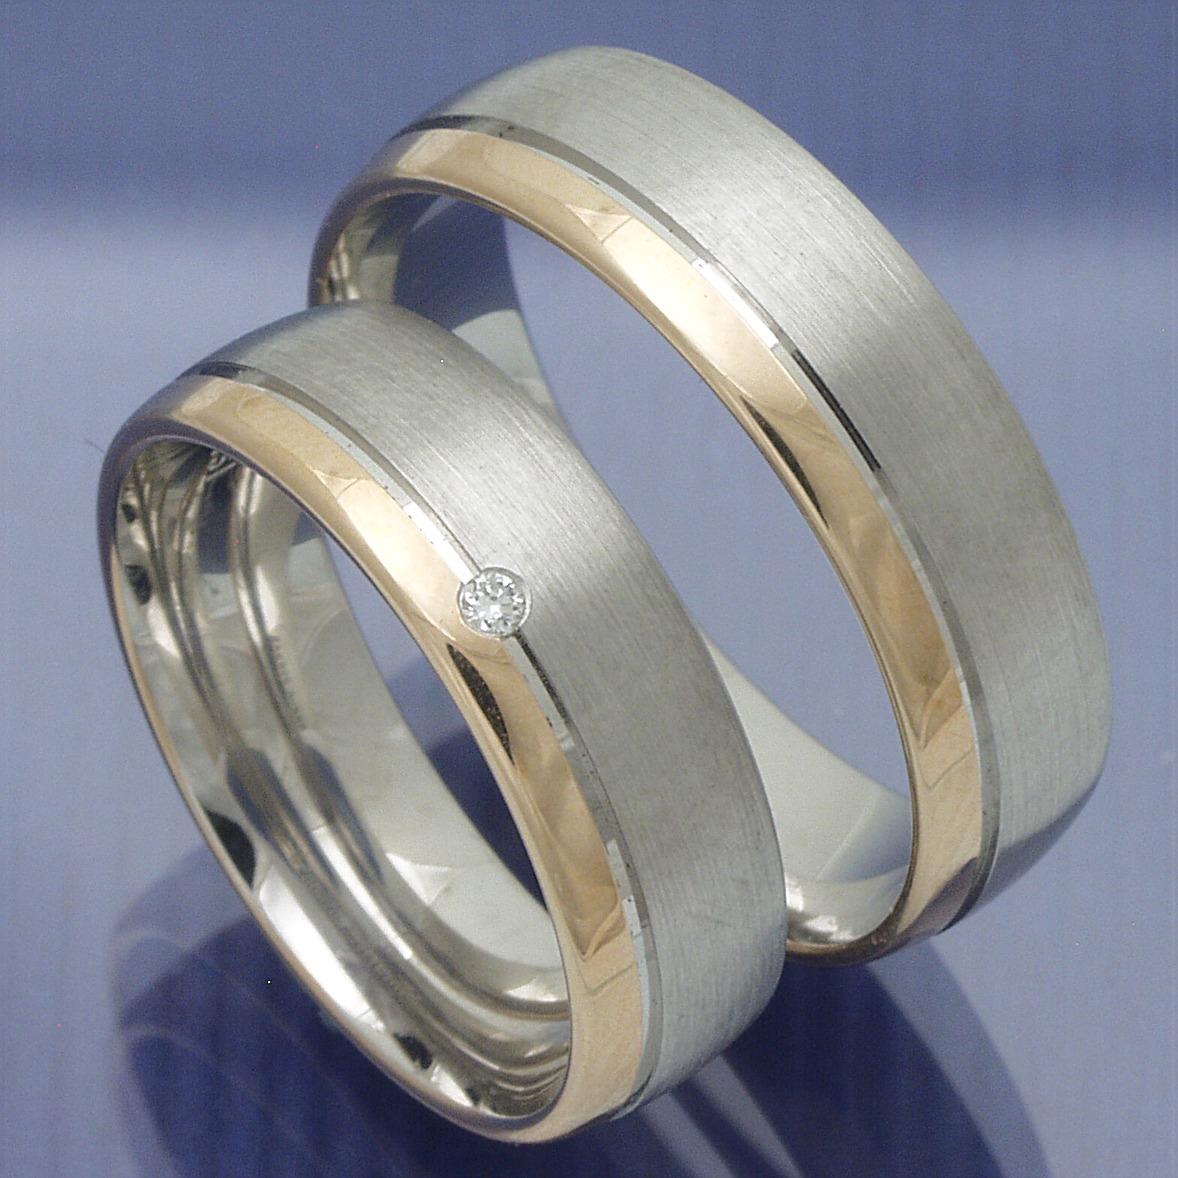 ... Gold Trauringe » Trauringe Verlobungsringe Silber Rotgold - Marlon